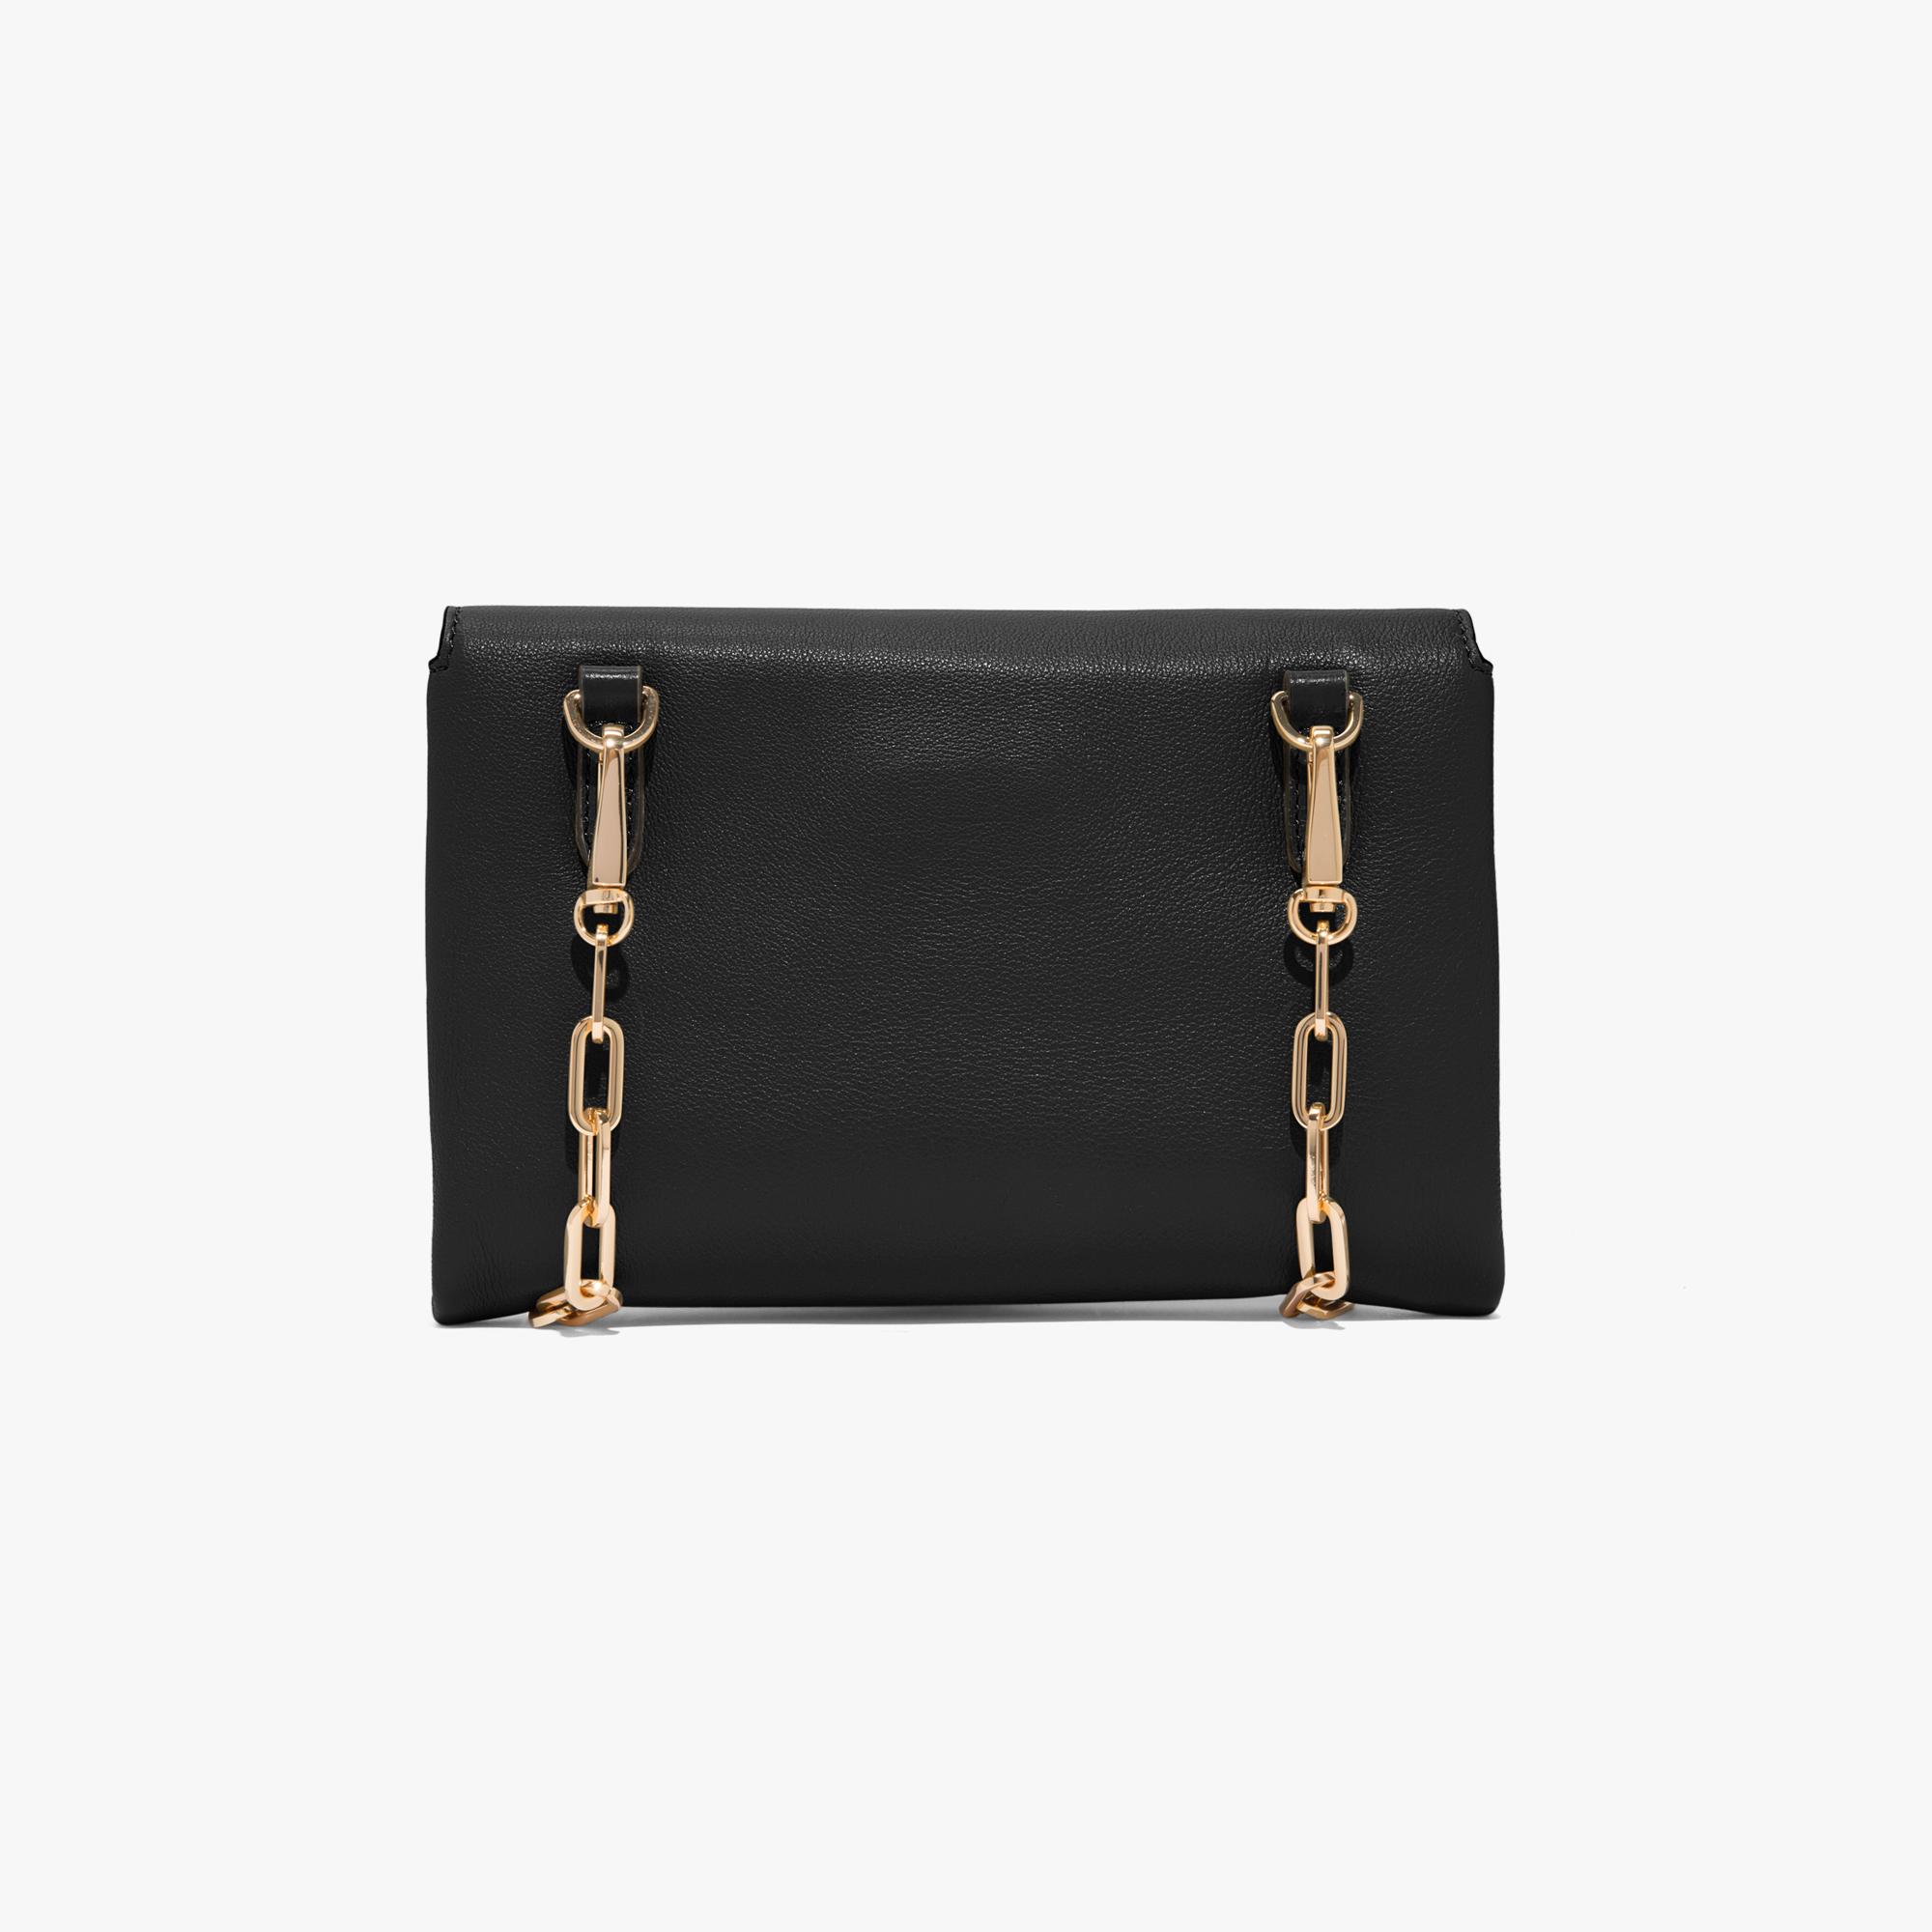 Arlettis leather clutch